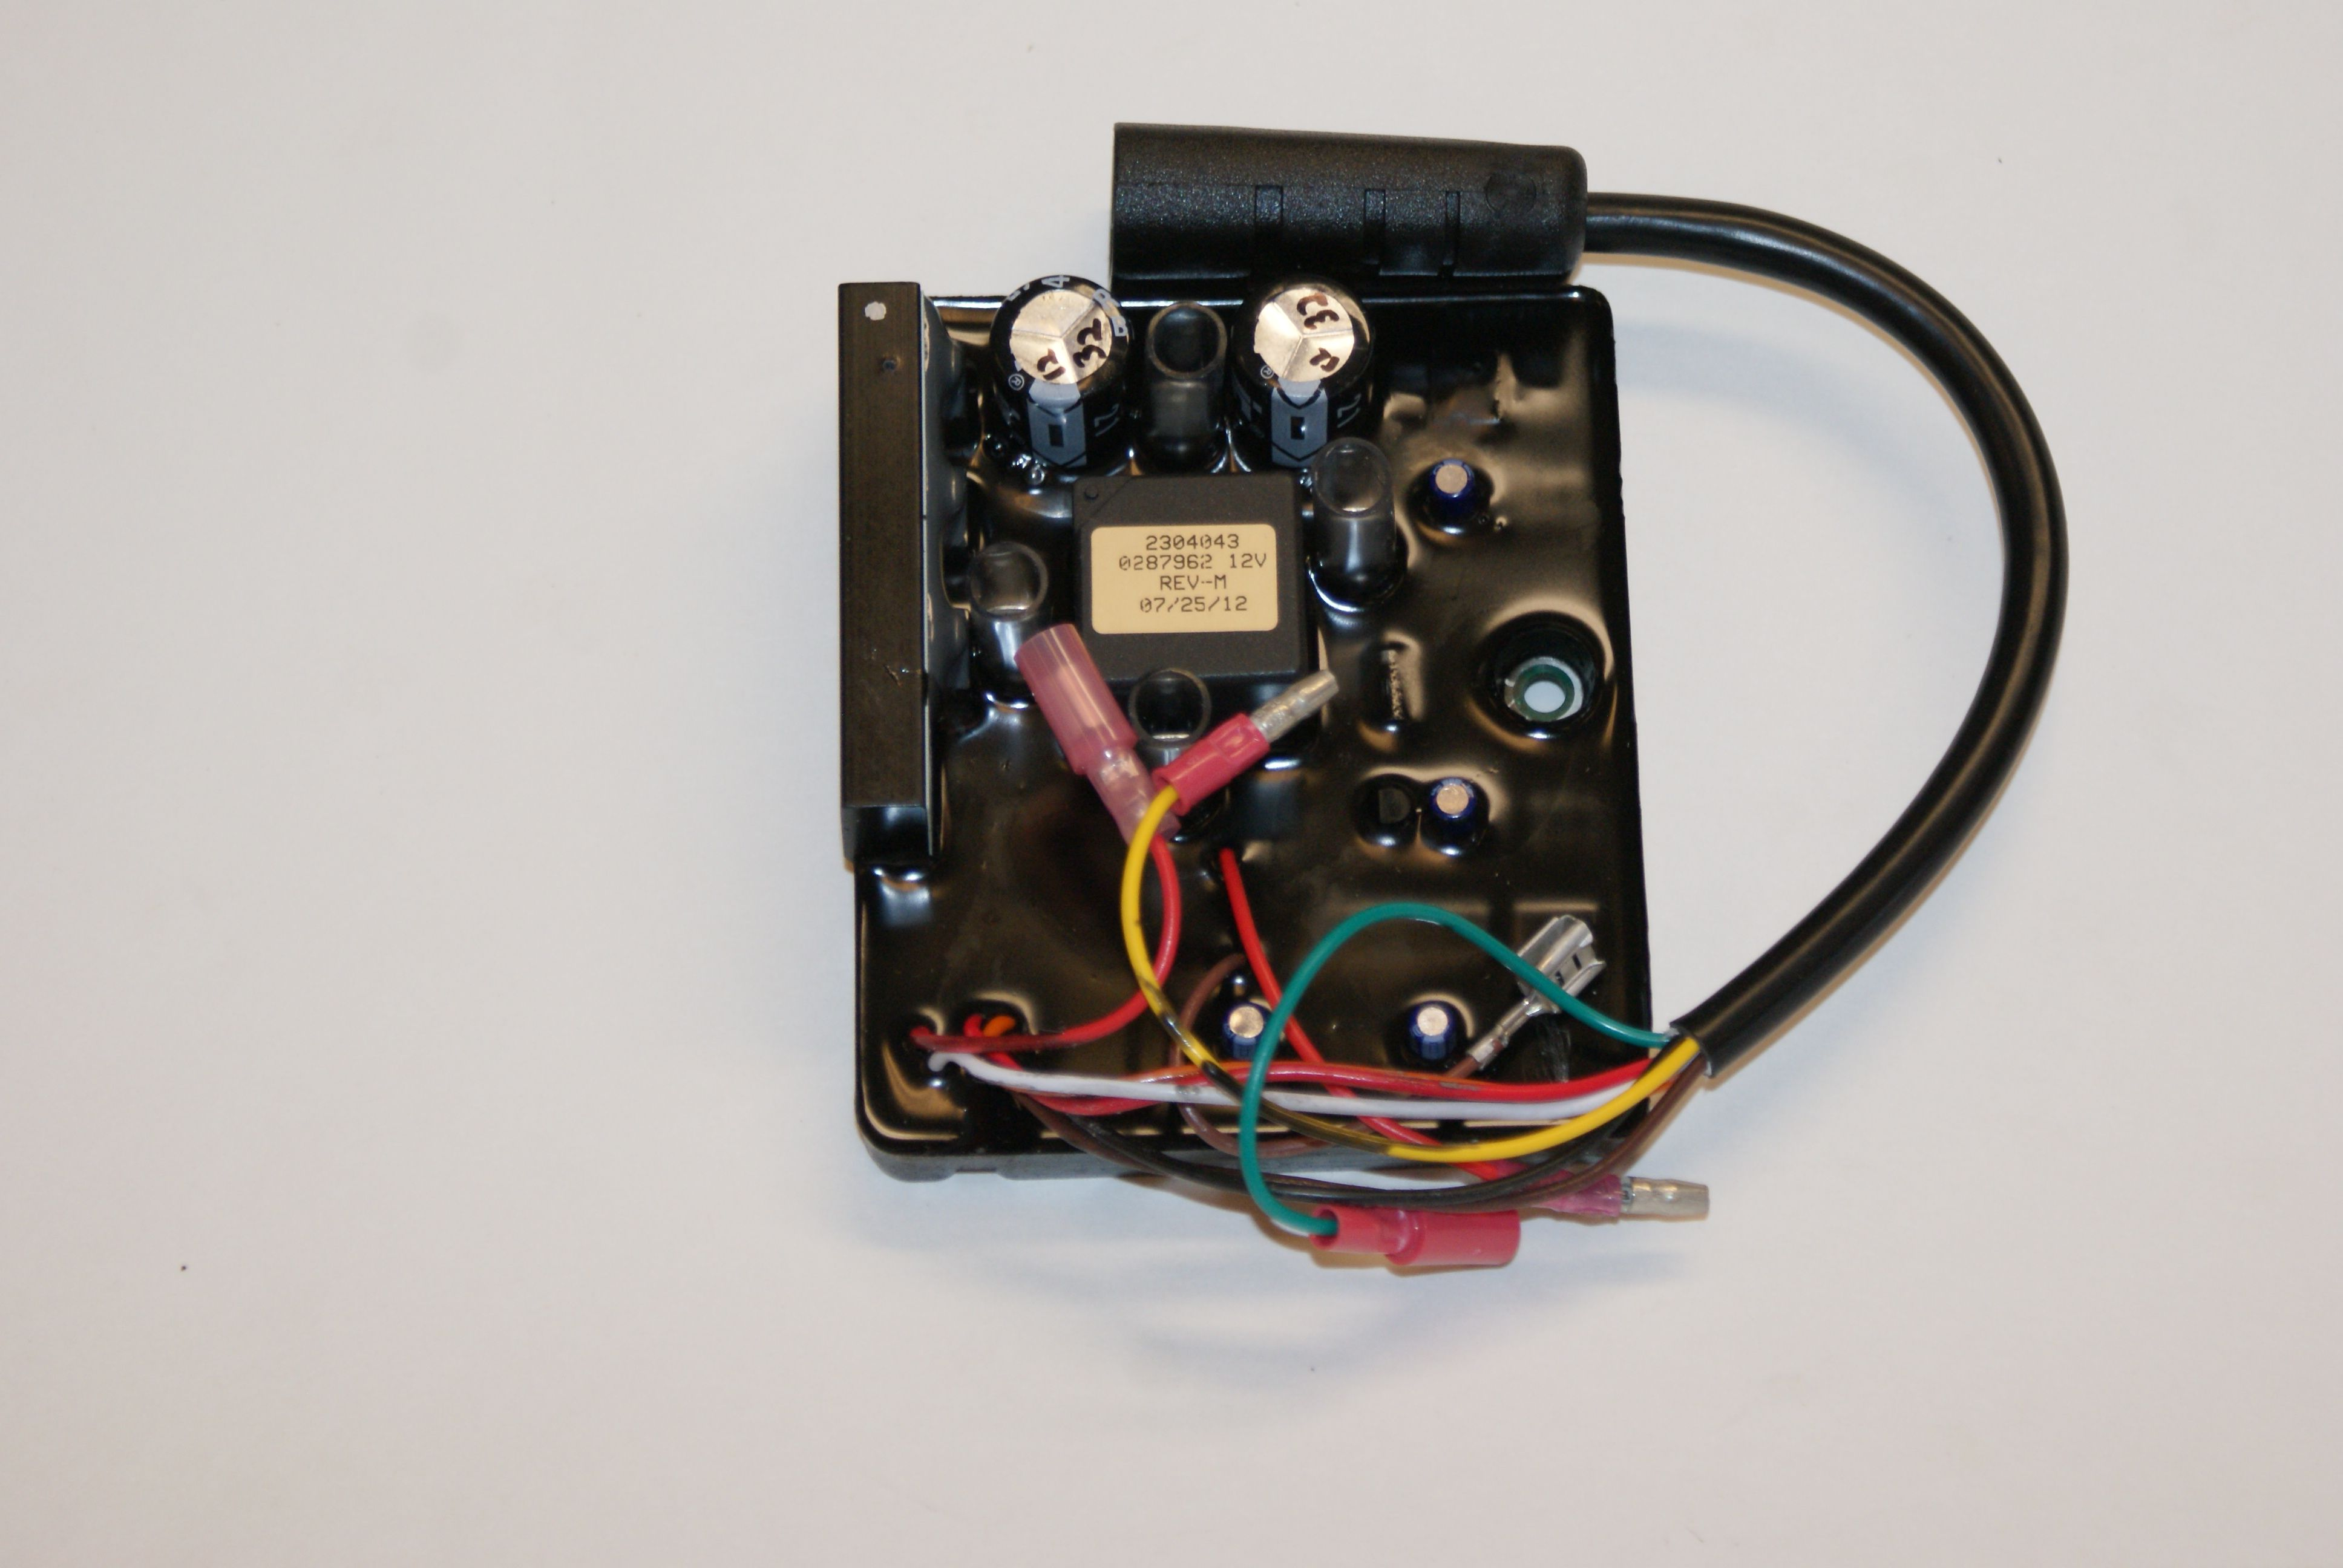 medium resolution of control board for legacy minn kota power drive bow mounts